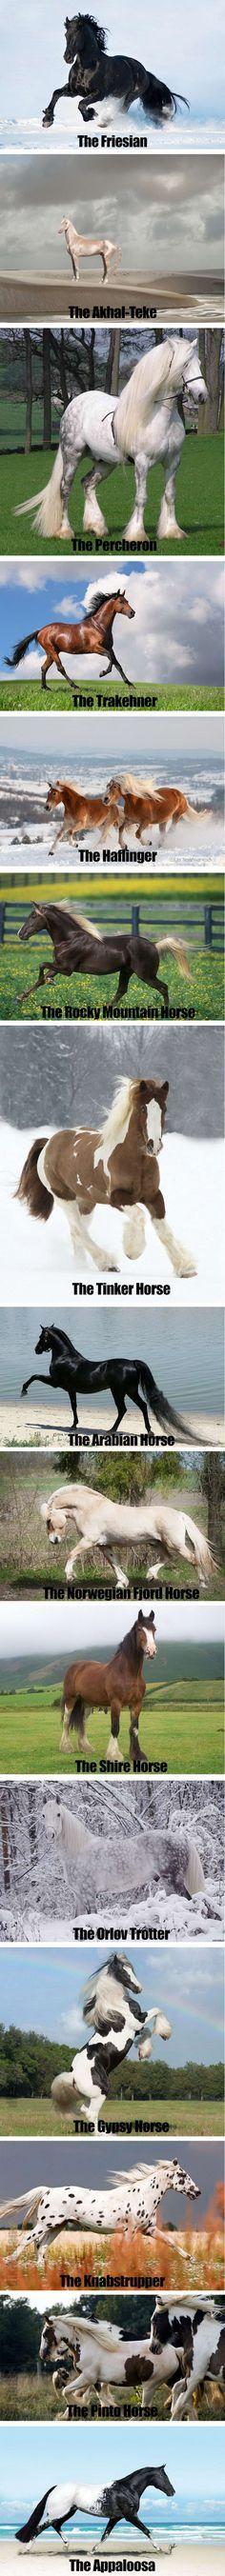 Breathtakingly Beautiful Horses - 9GAG